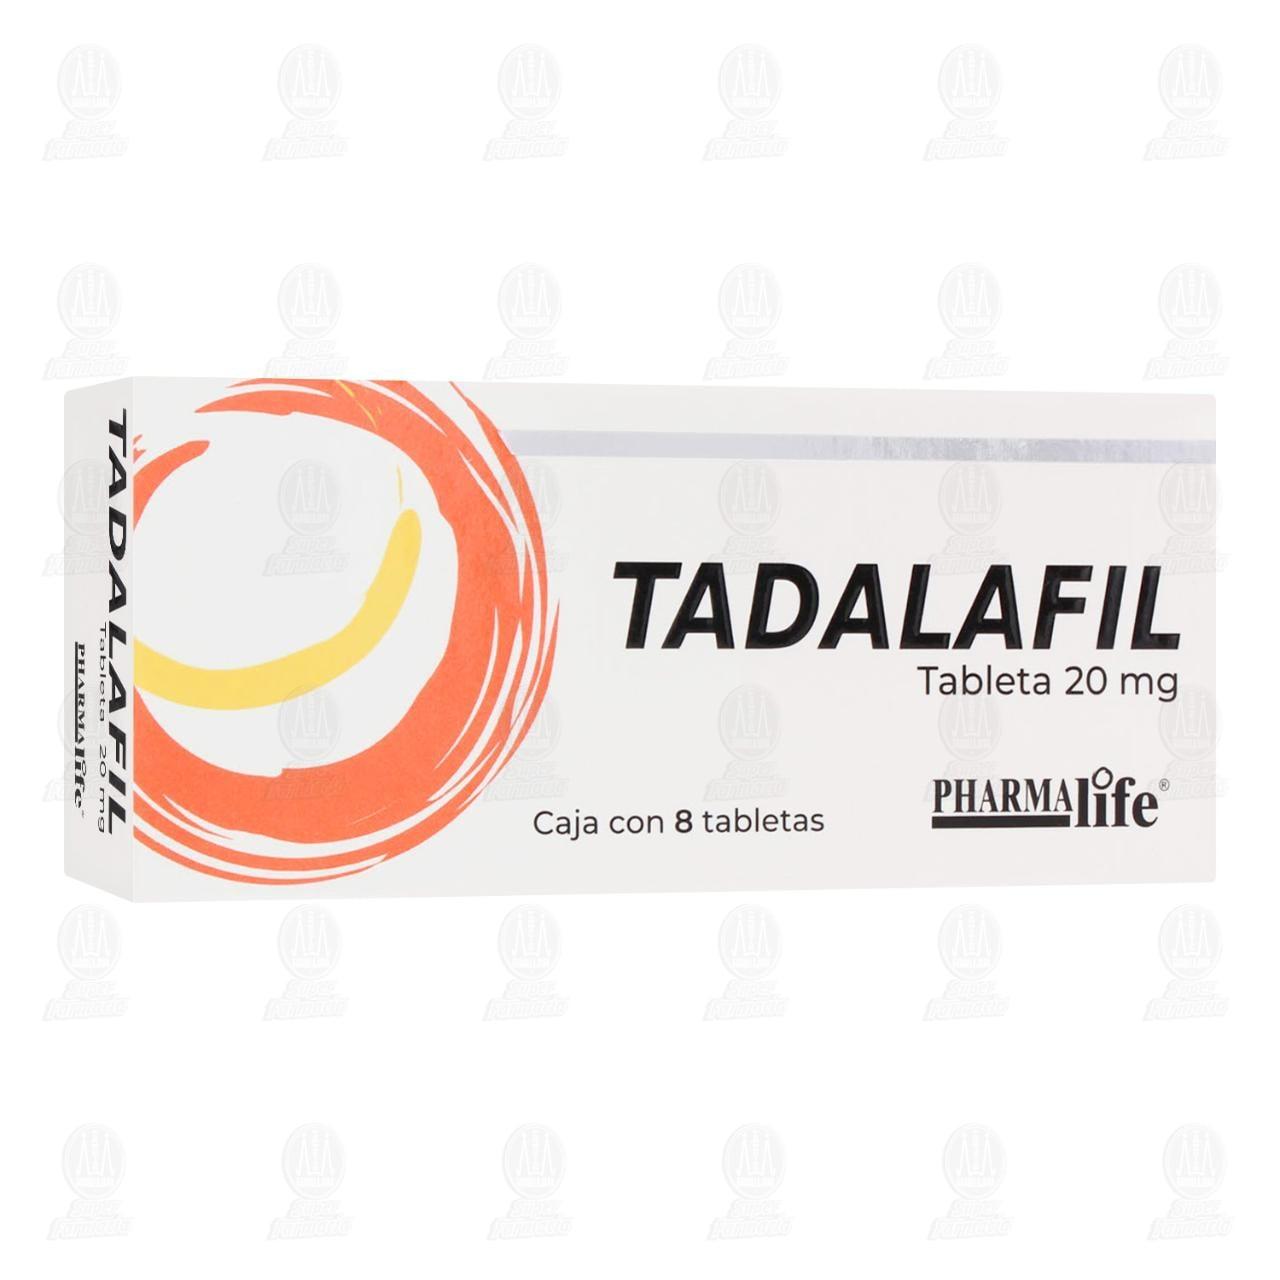 Comprar Tadalafil 20mg 8 Tabletas Pharmalife en Farmacias Guadalajara